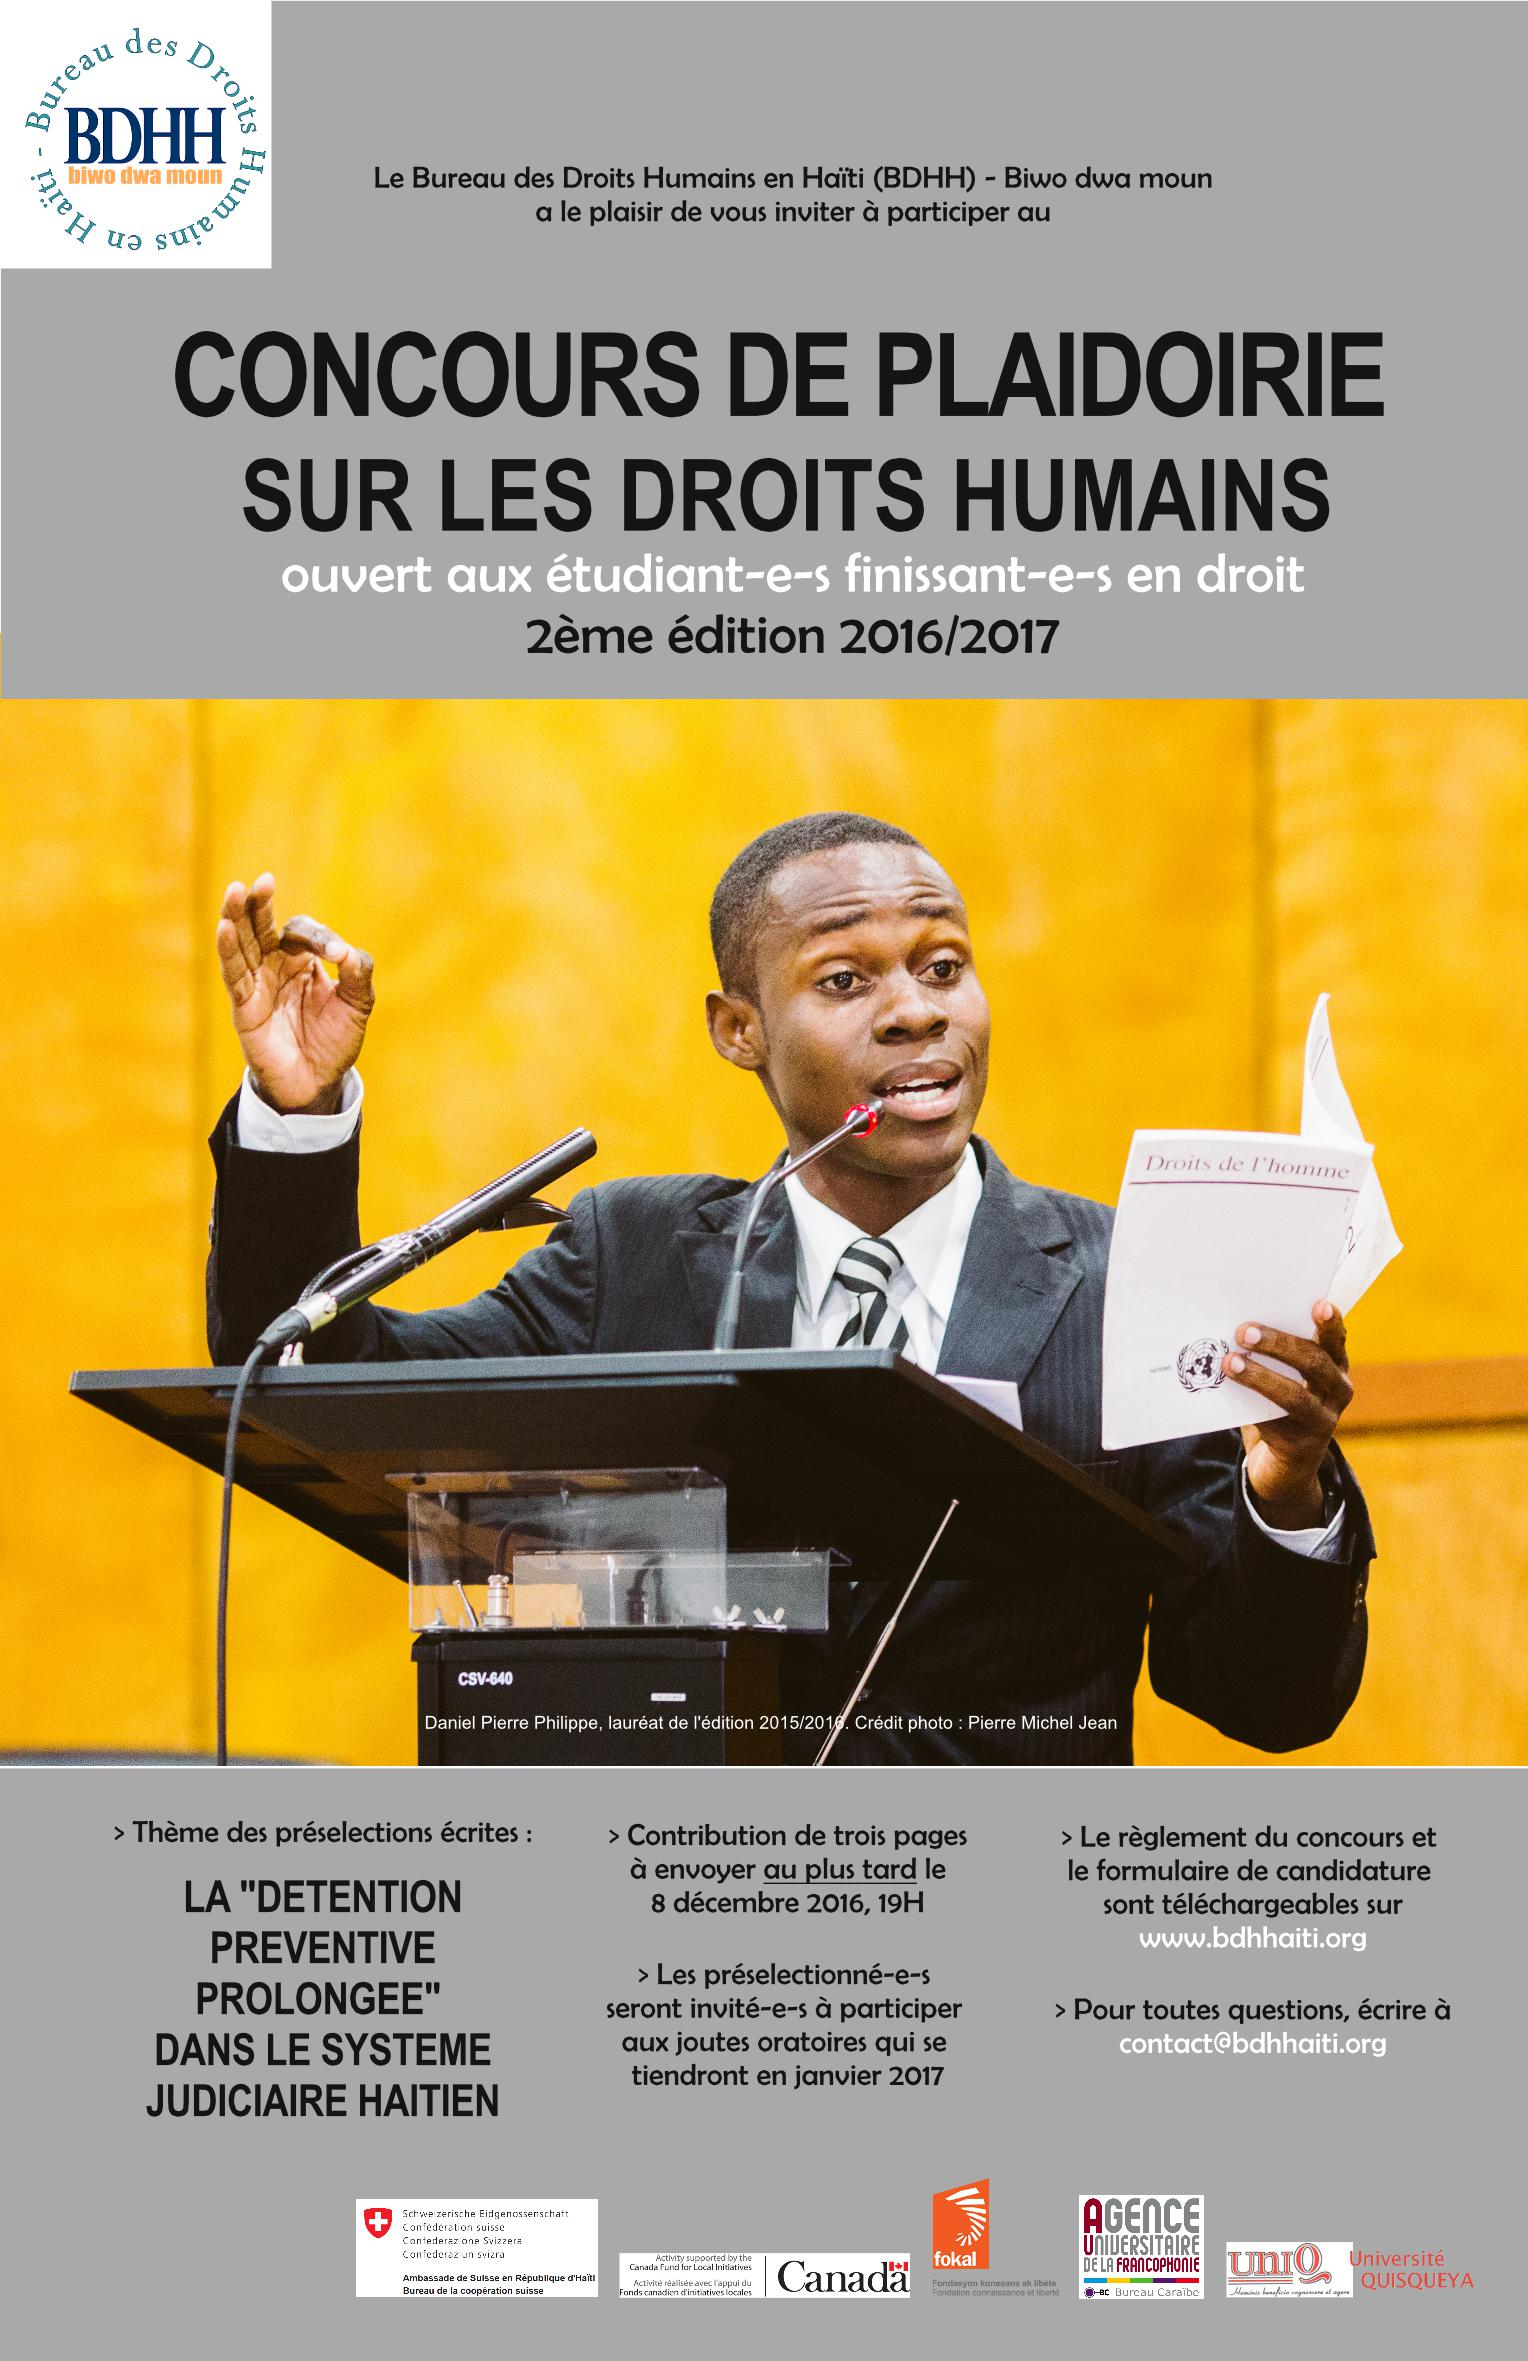 Bureau des droits humains en ha ti bdhh biwo dwa moun biwo dwa moun - Bureau des concours aphp ...